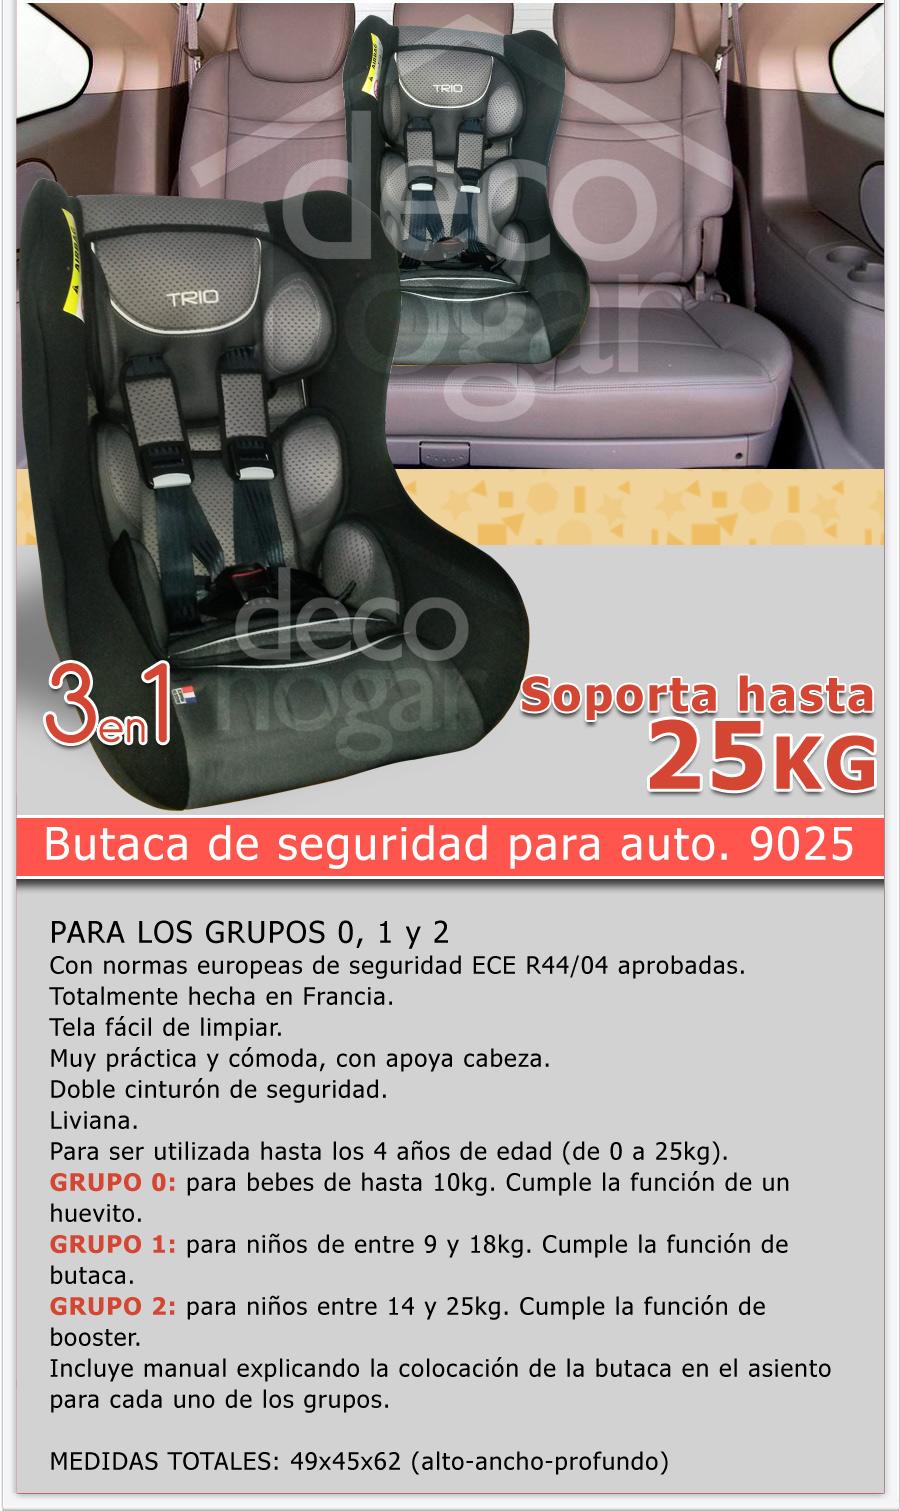 Butaca porta bebe huevito ni os bebesit 9025 hasta 25kg for Butaca de bebe para auto